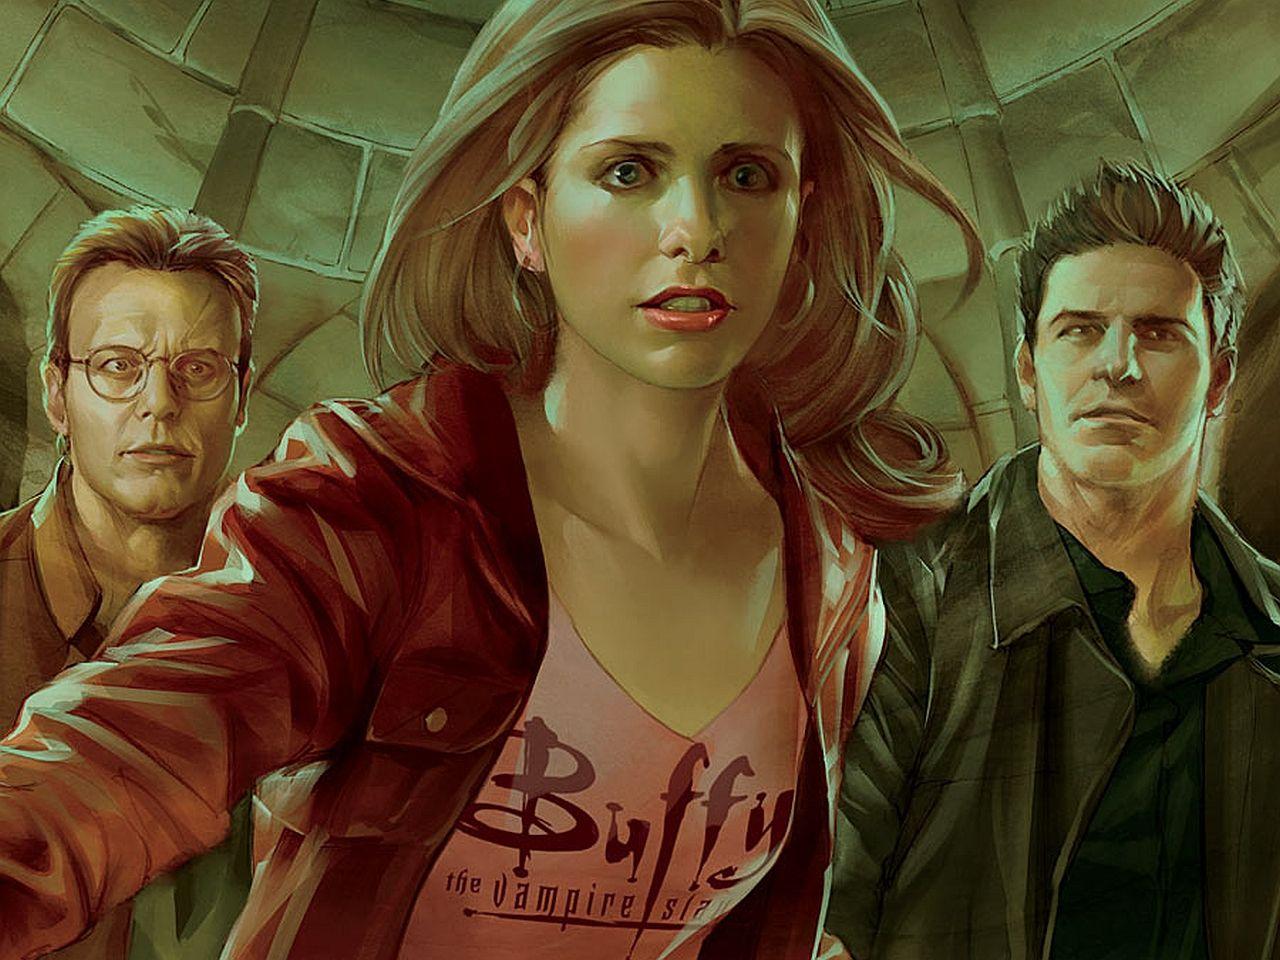 Pin By Nyx Greenfire On Board 20 Buffy The Vampire Slayer Vampire Slayer Buffy